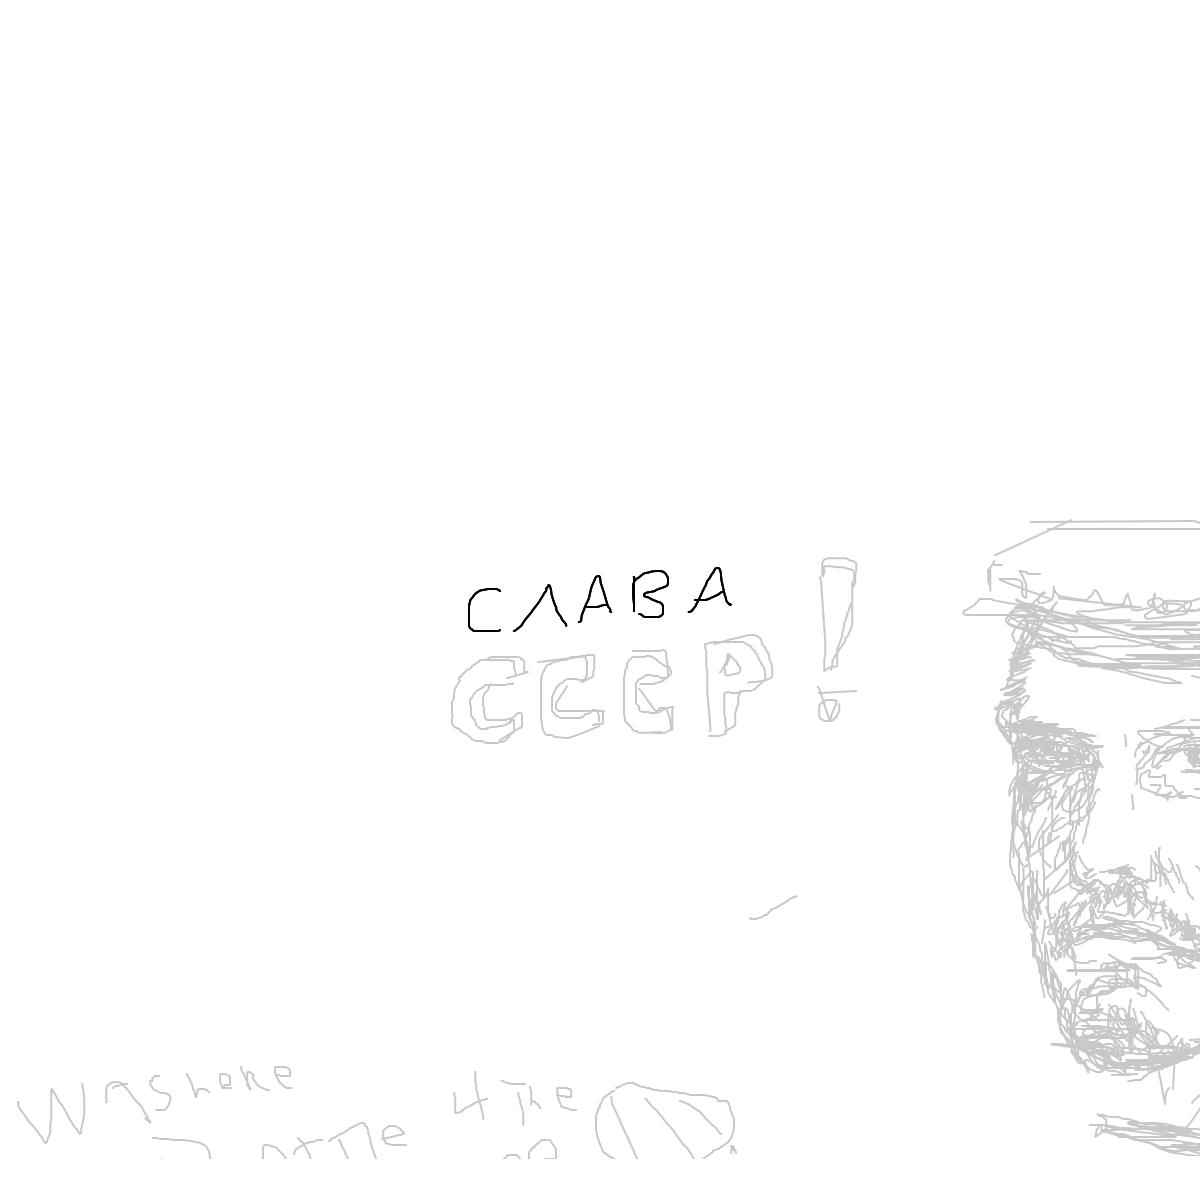 BAAAM drawing#5489 lat:47.9961547851562500lng: 37.8114967346191400